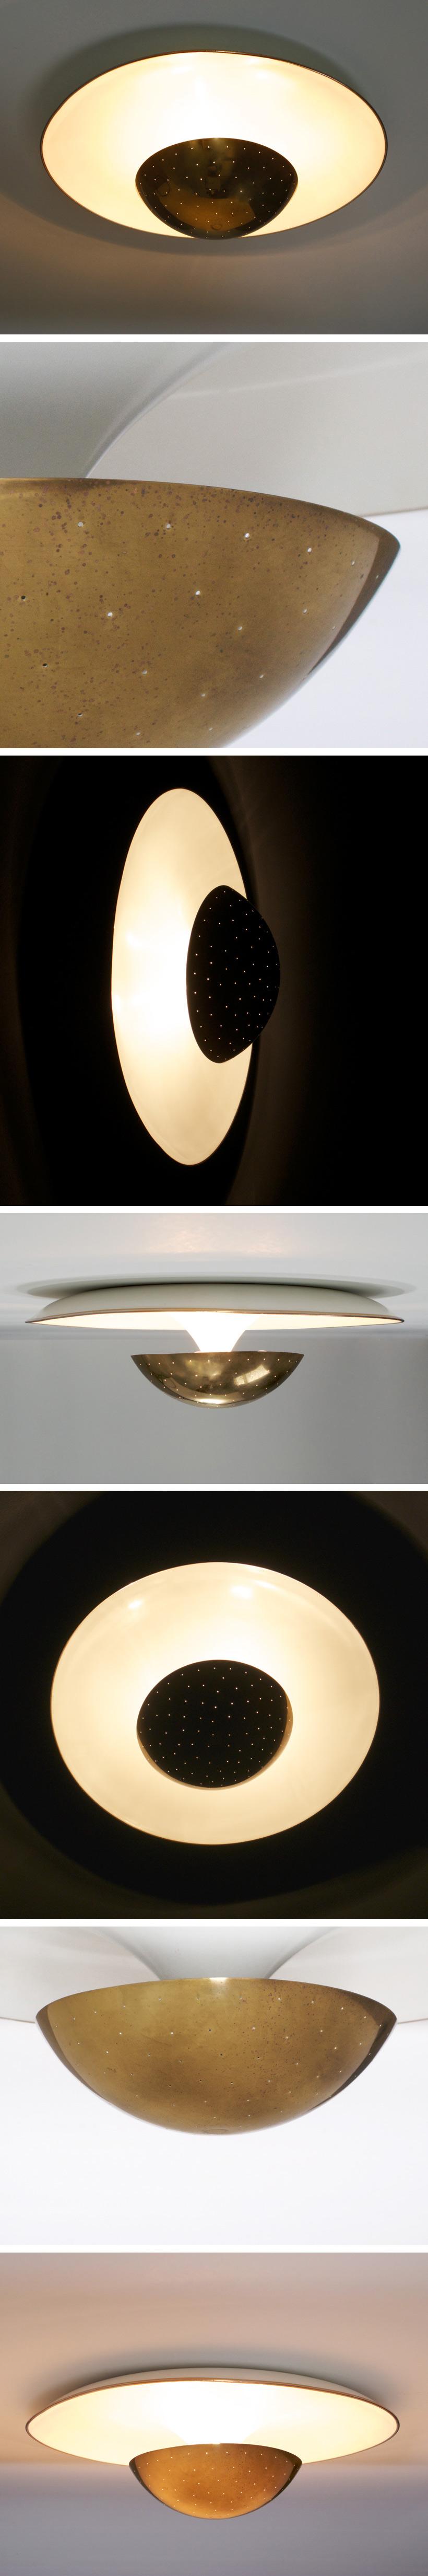 Gino Sarfatti Arteluce ceiling lamp Large